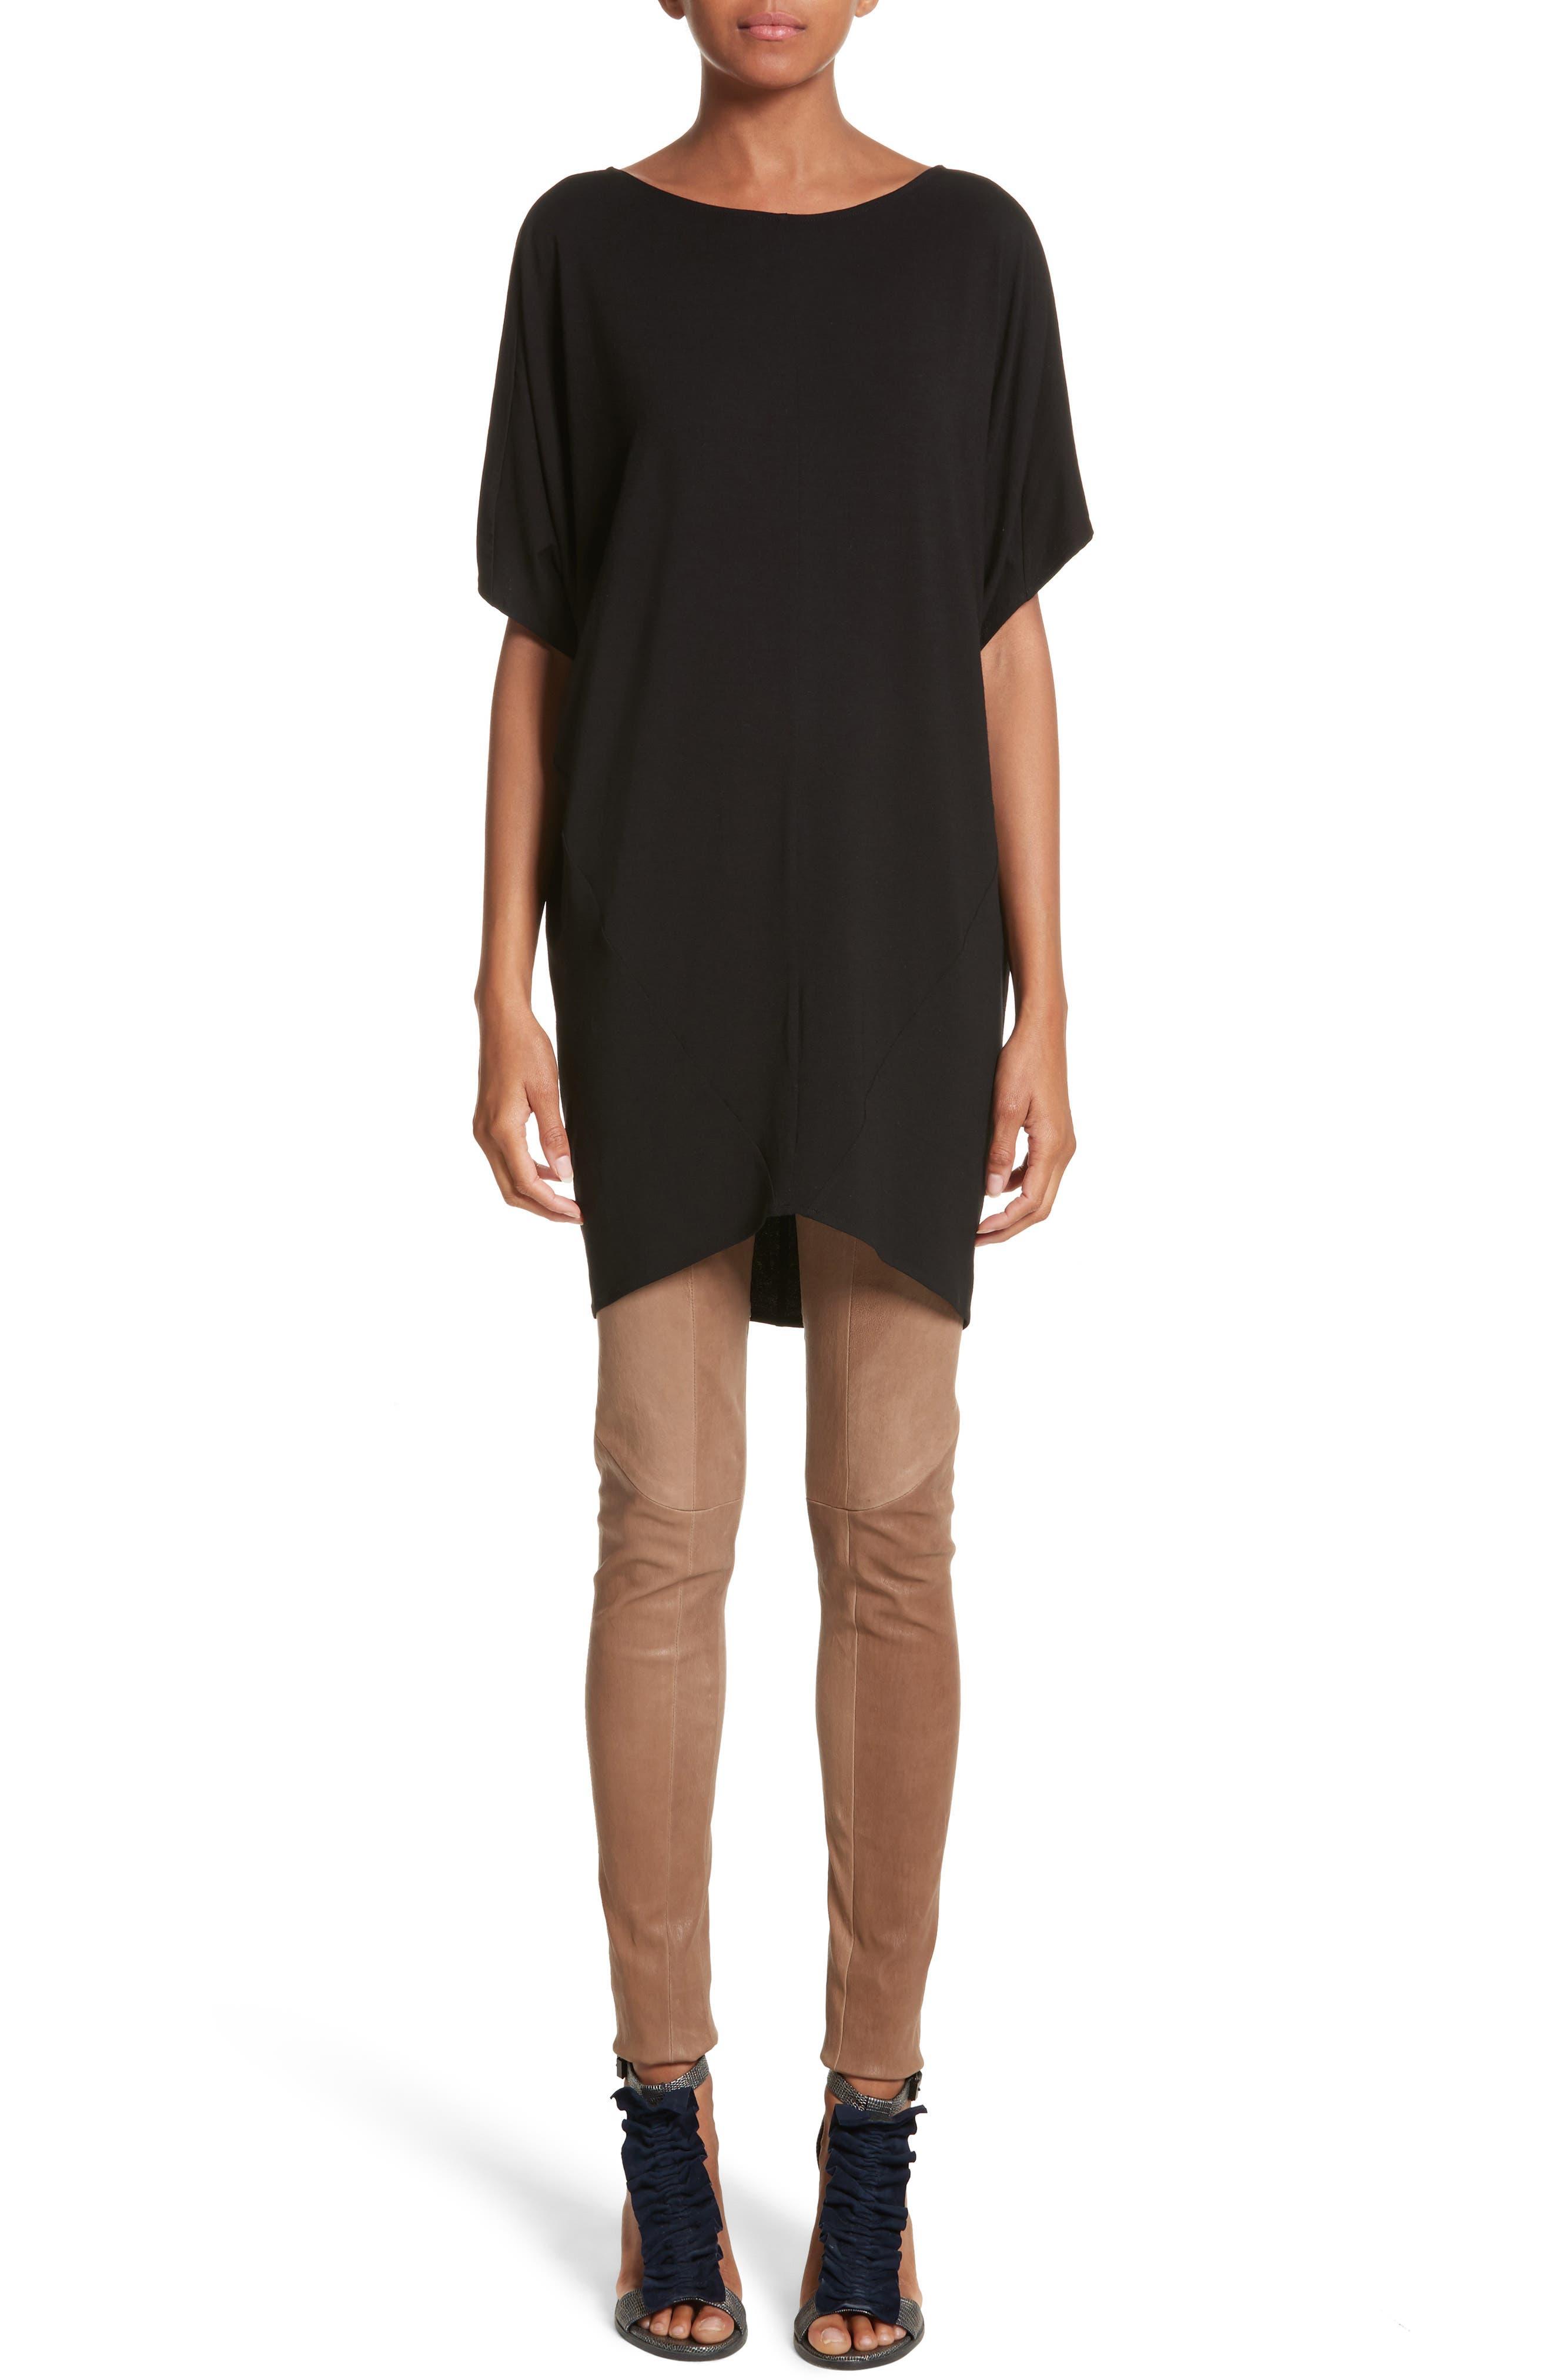 Alternate Image 1 Selected - Zero + Maria Cornejo Jersey Dress